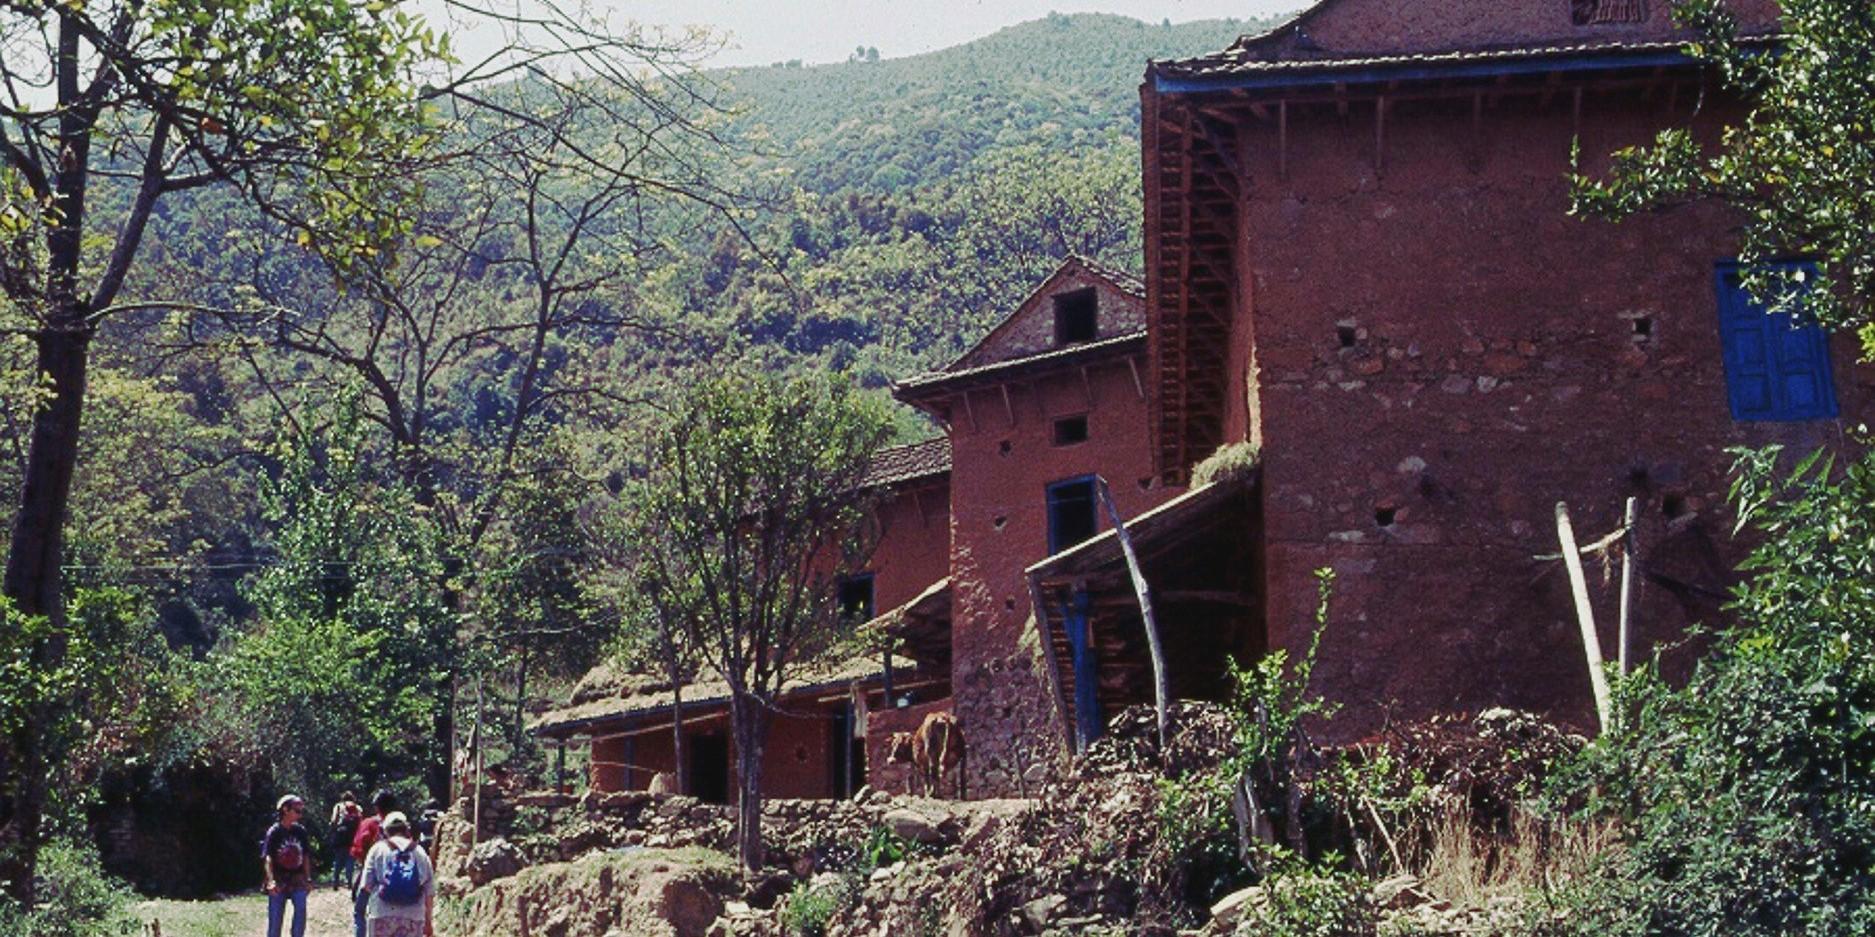 nagarkot-village-trail-1875x1055